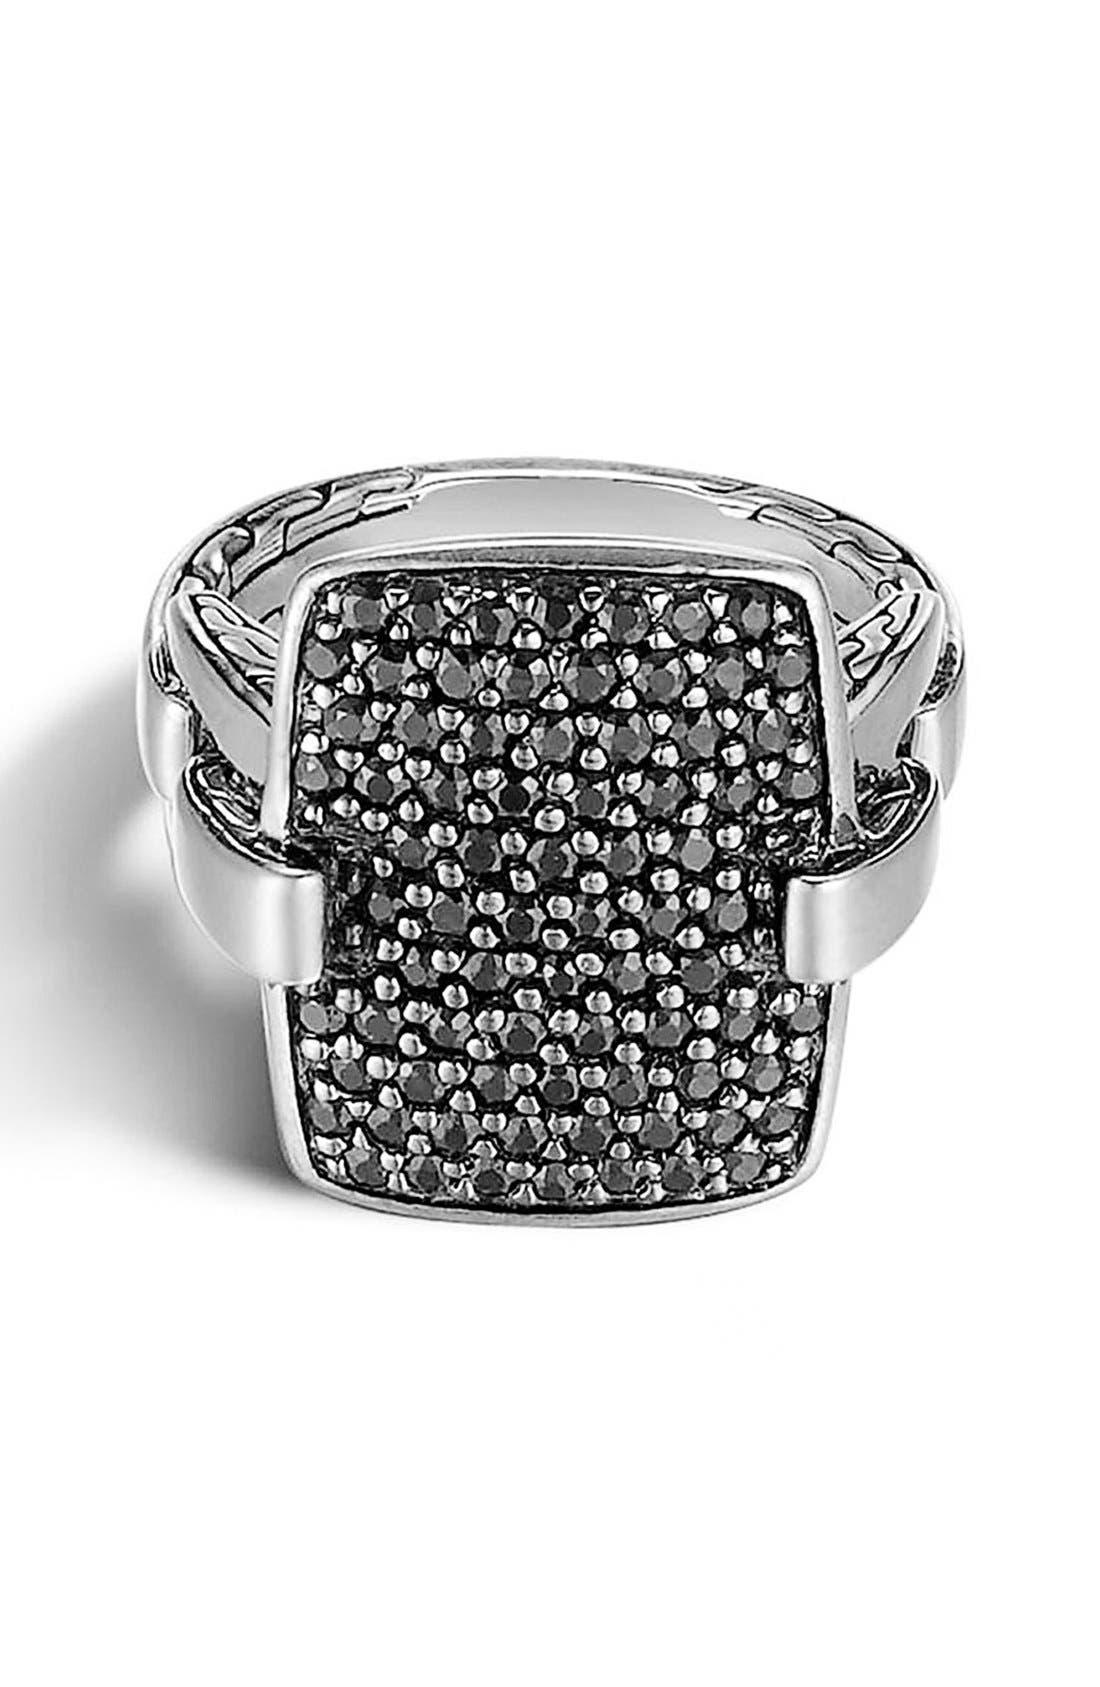 Main Image - John Hardy 'Classic Chain' Rectangular Ring